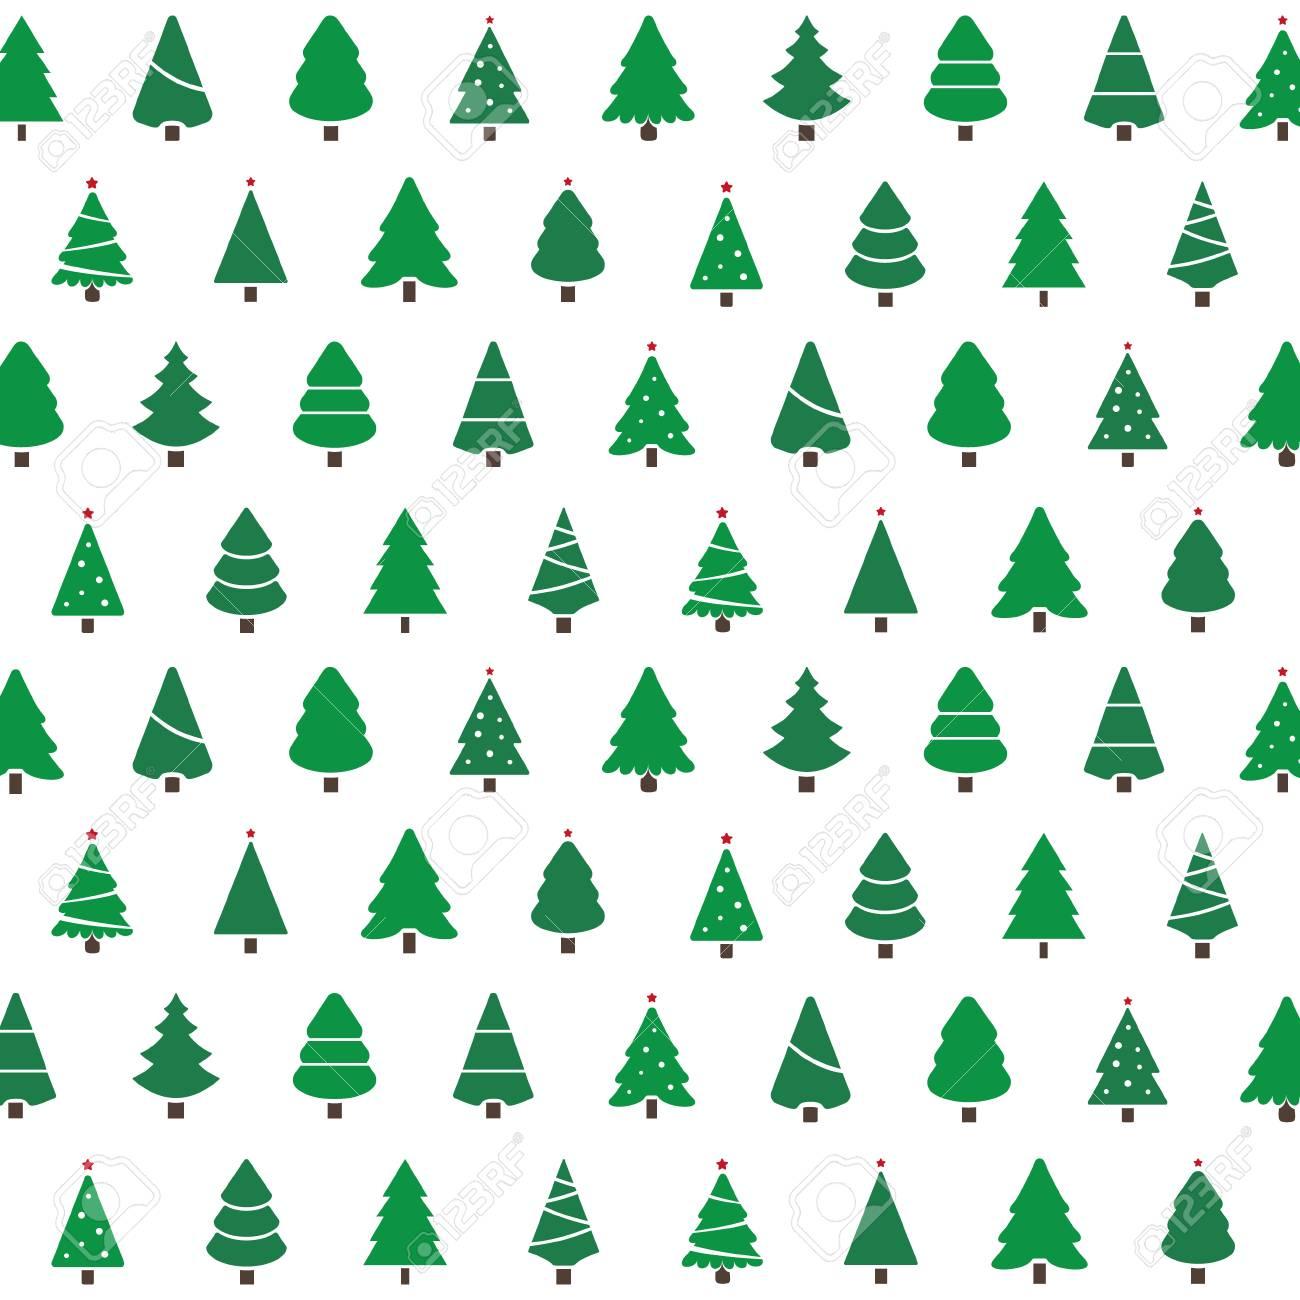 Christmas Tree Pattern.Christmas Tree Pattern Background